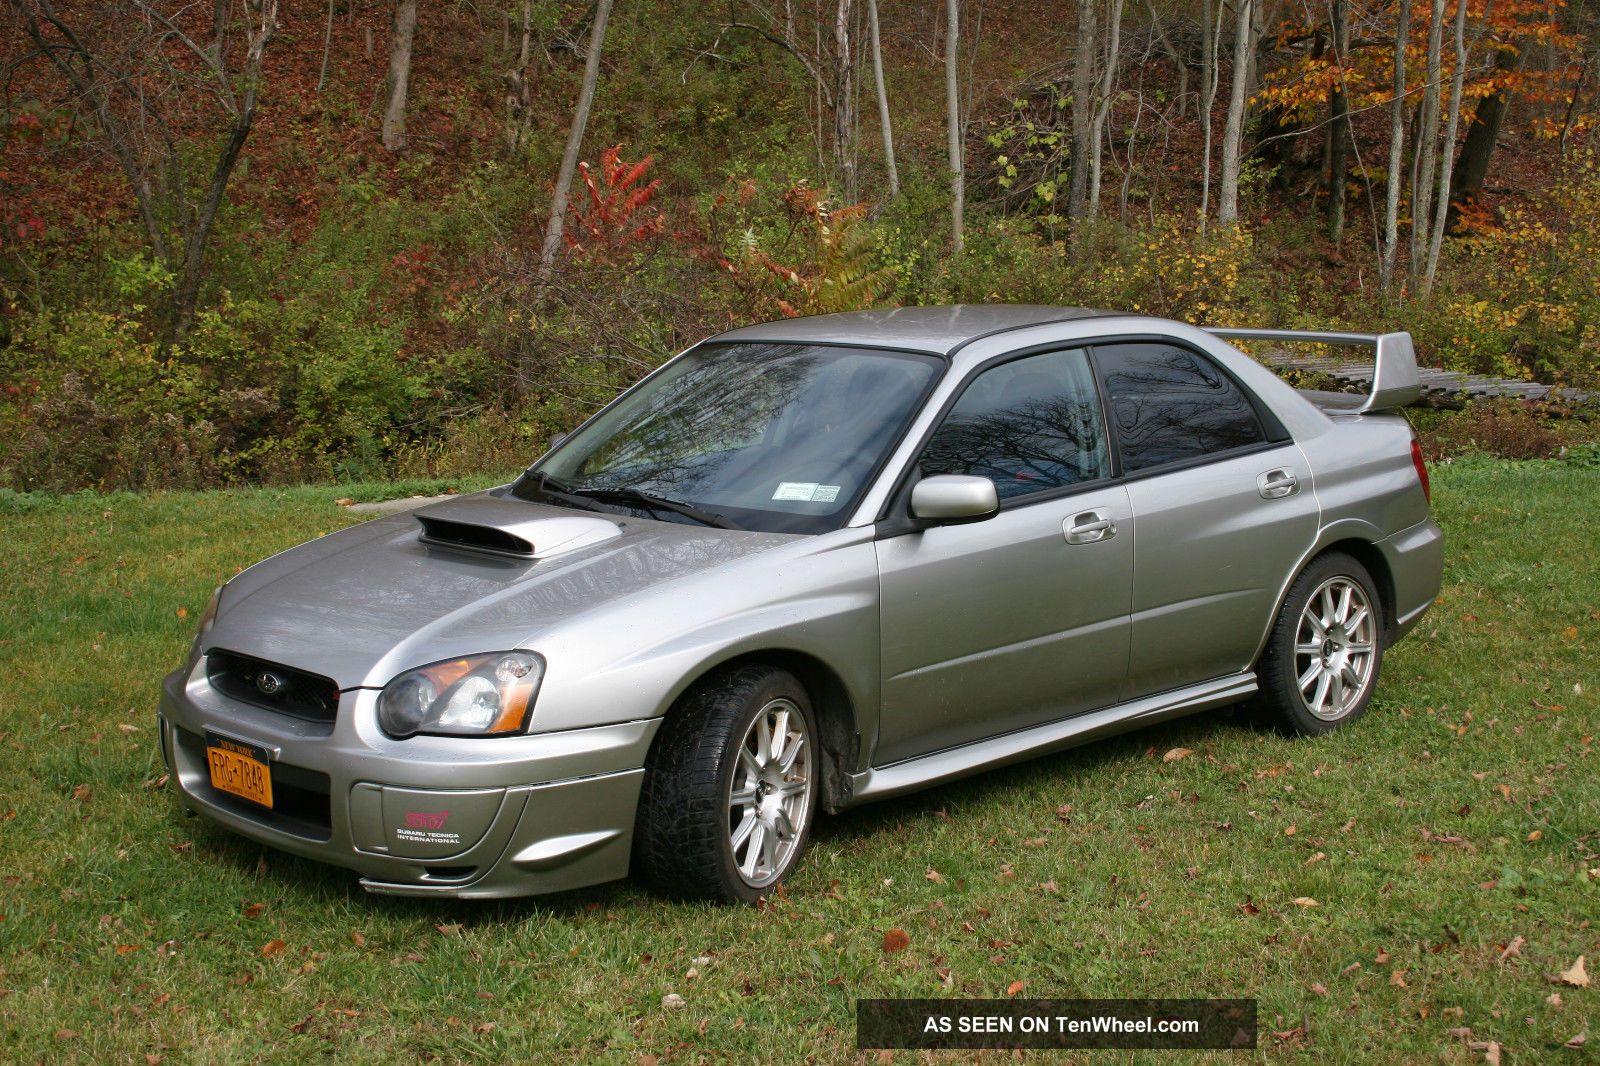 2005 Subaru Impreza Wrx Sti - Impreza photo